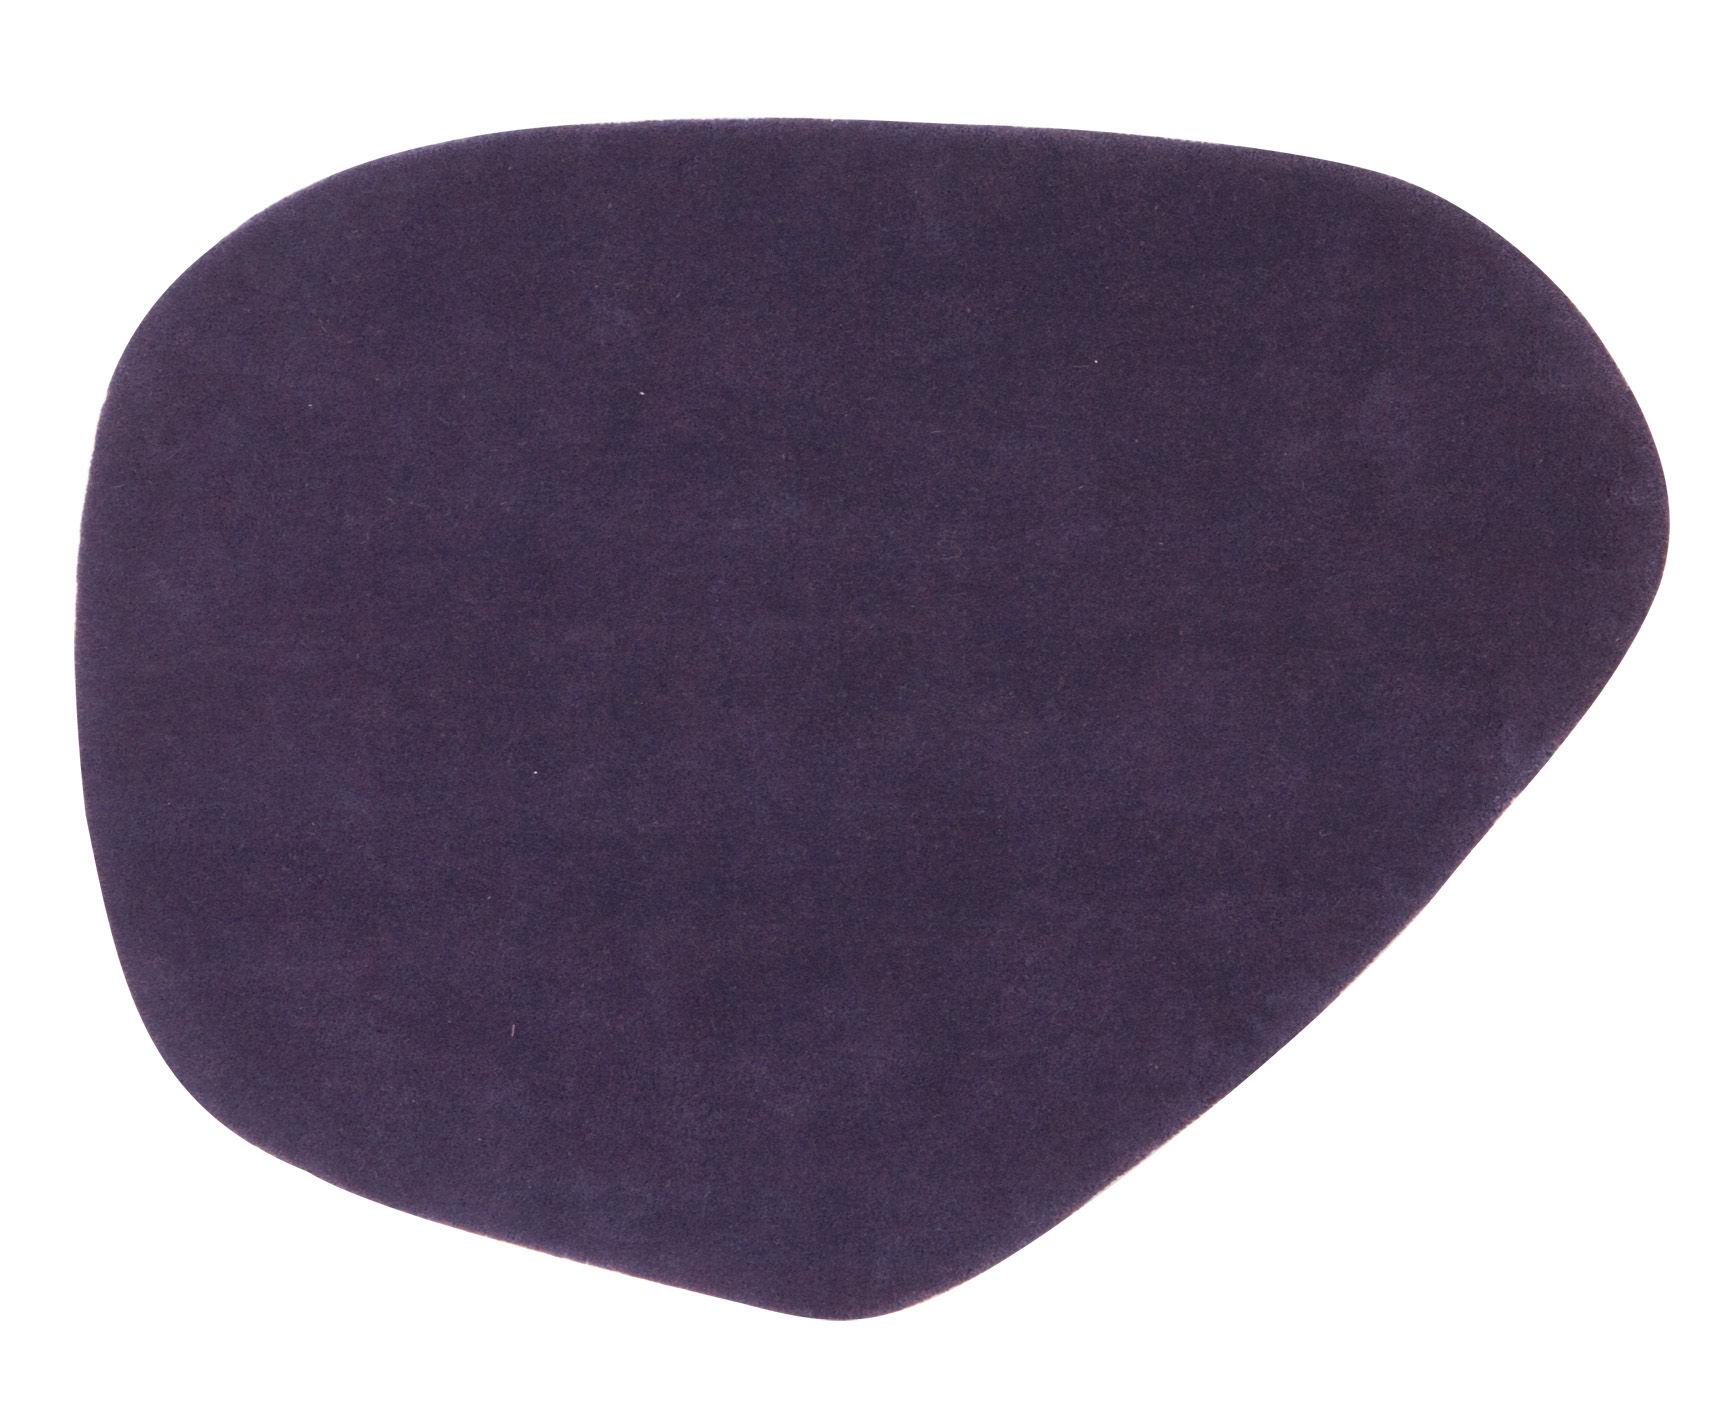 Mobilier - Tapis - Tapis Calder 90 x 120 cm - Nanimarquina - 90 x 120 cm / Violet - Laine